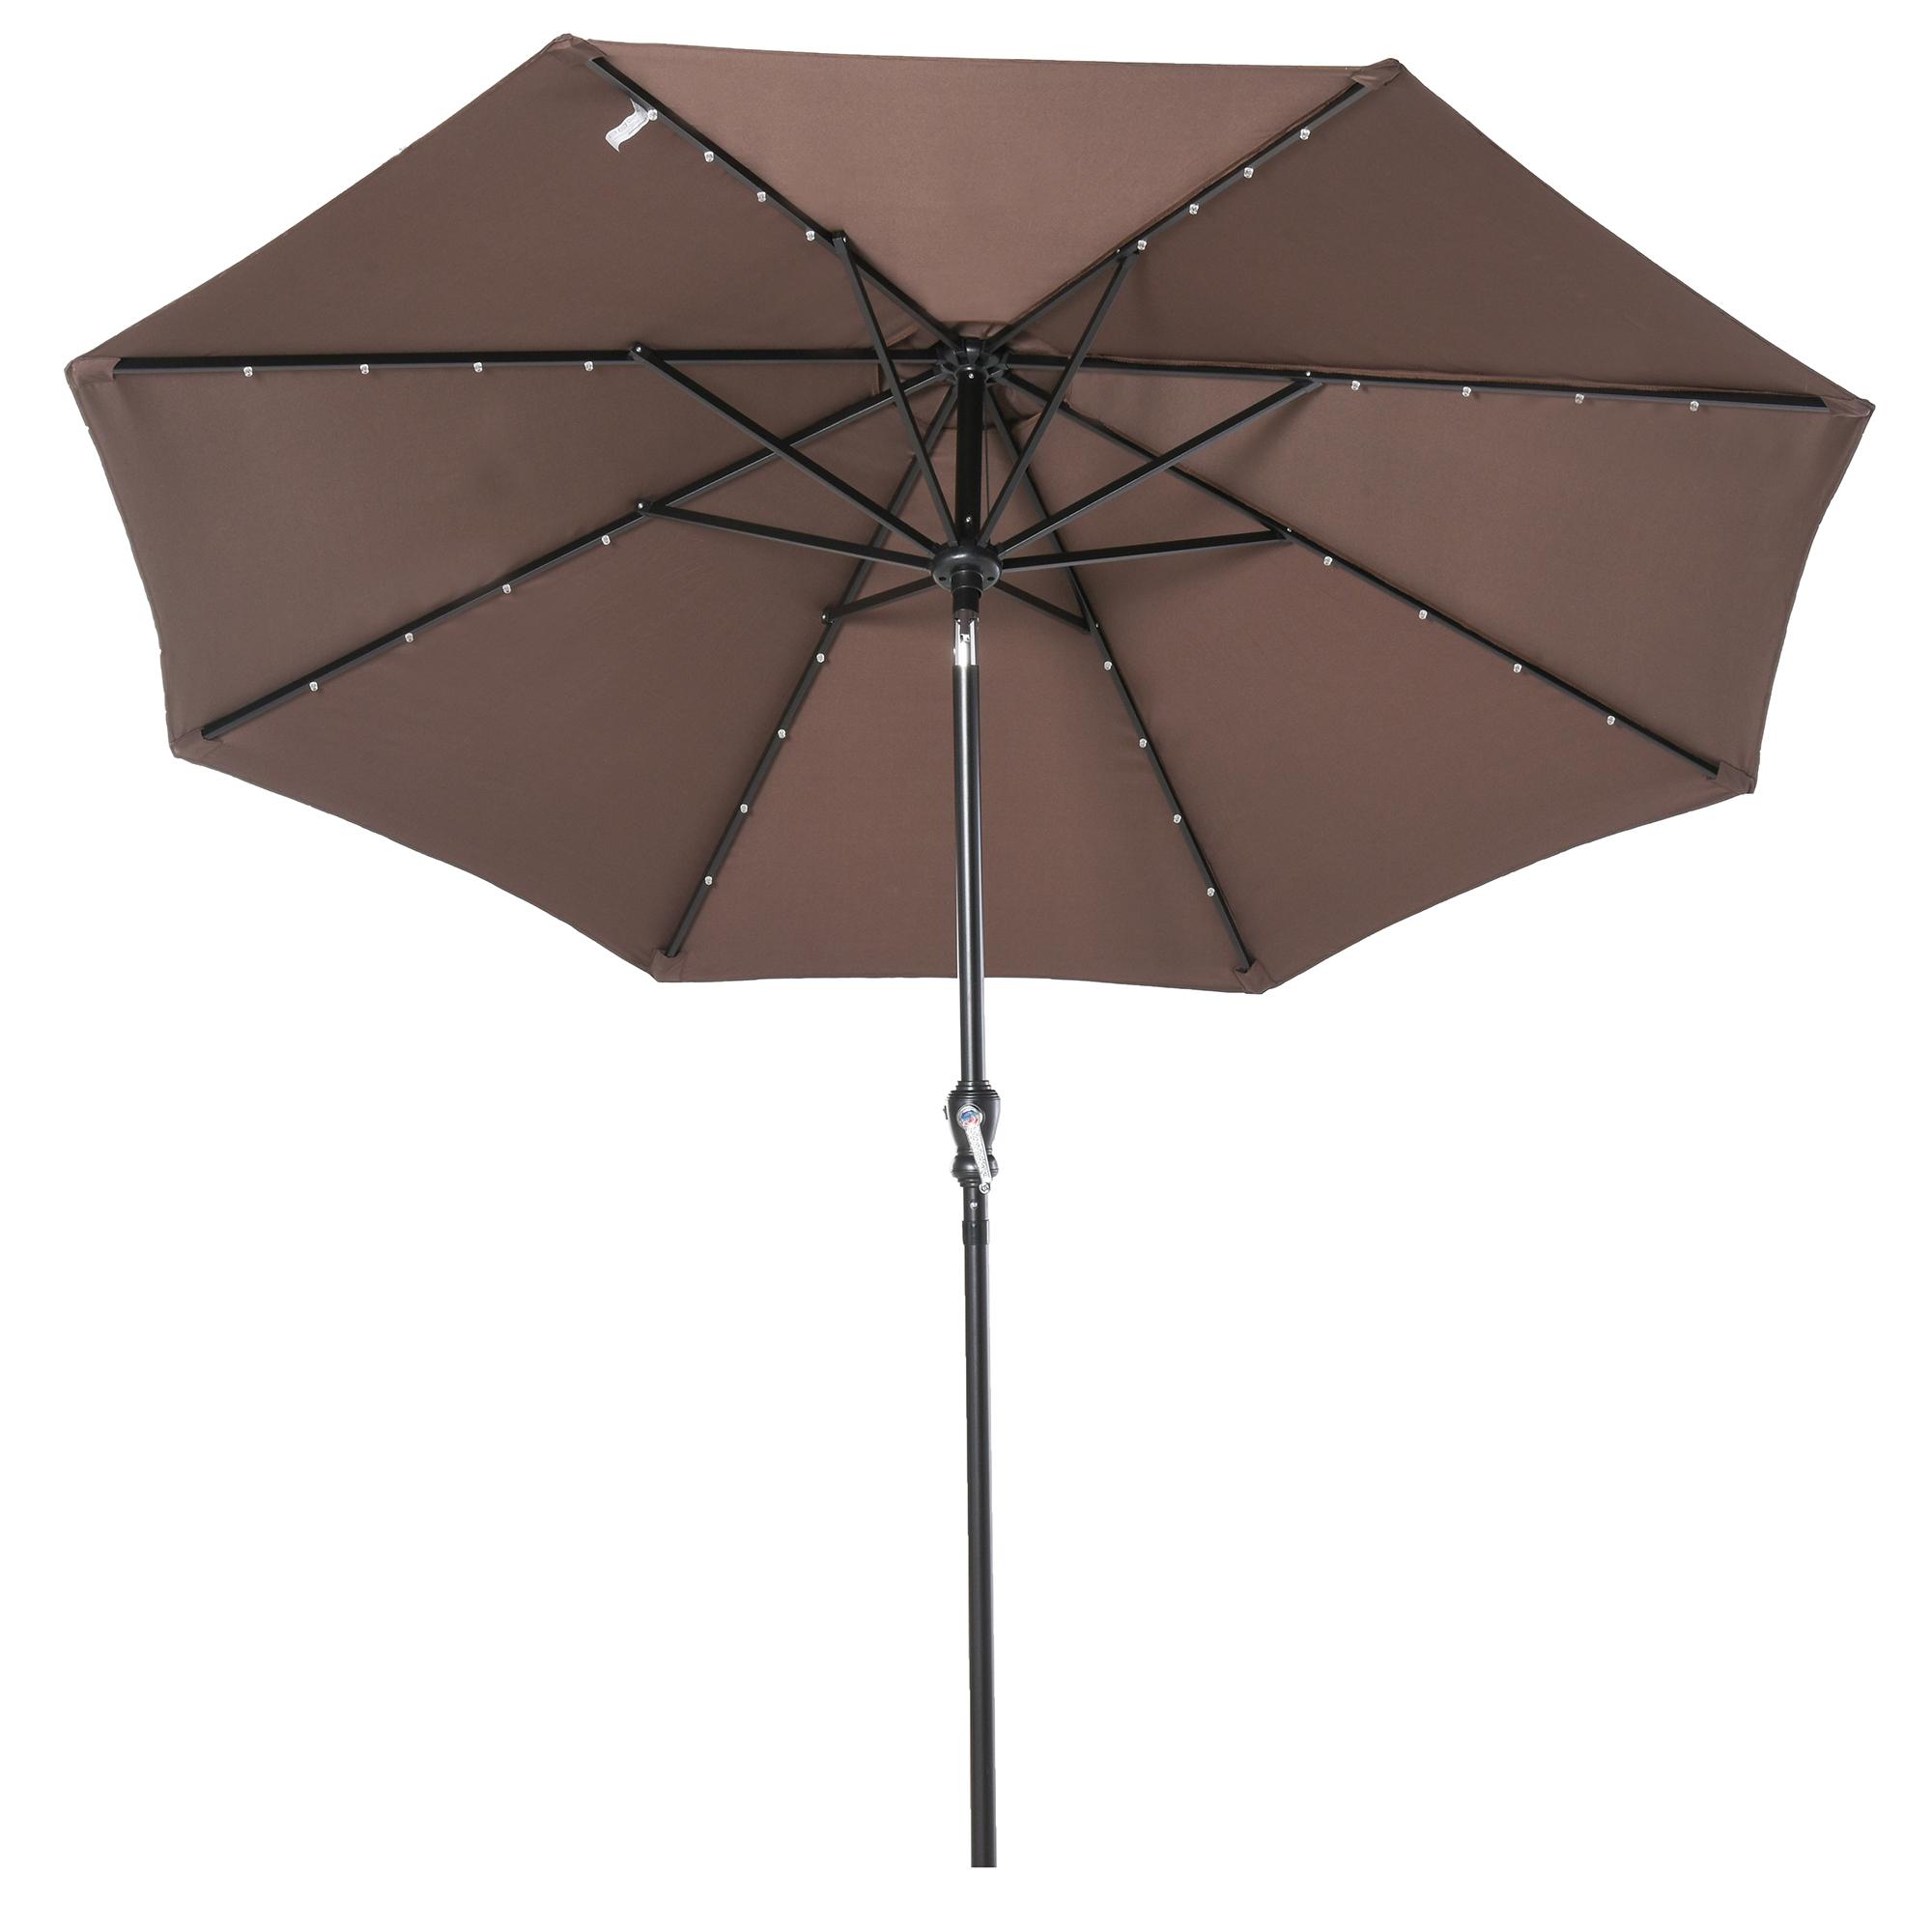 Parasol lumineux octogonal inclinable chocolat